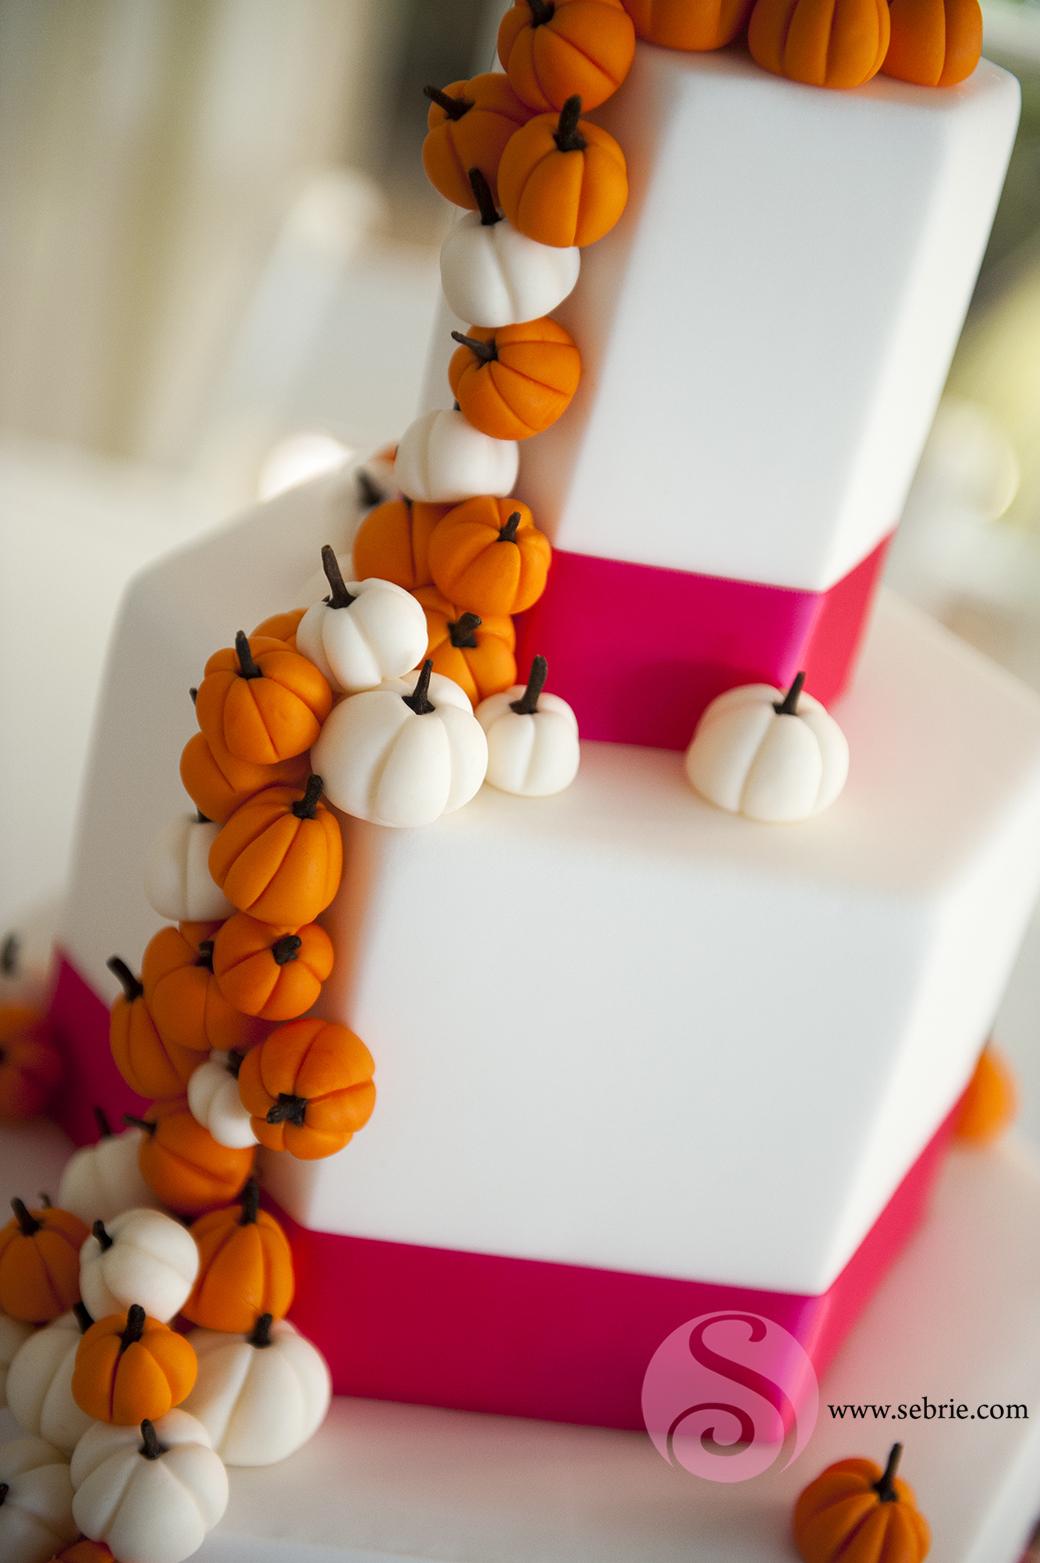 Theme wedding Halloween inspired wedding cake - Sebrie Images